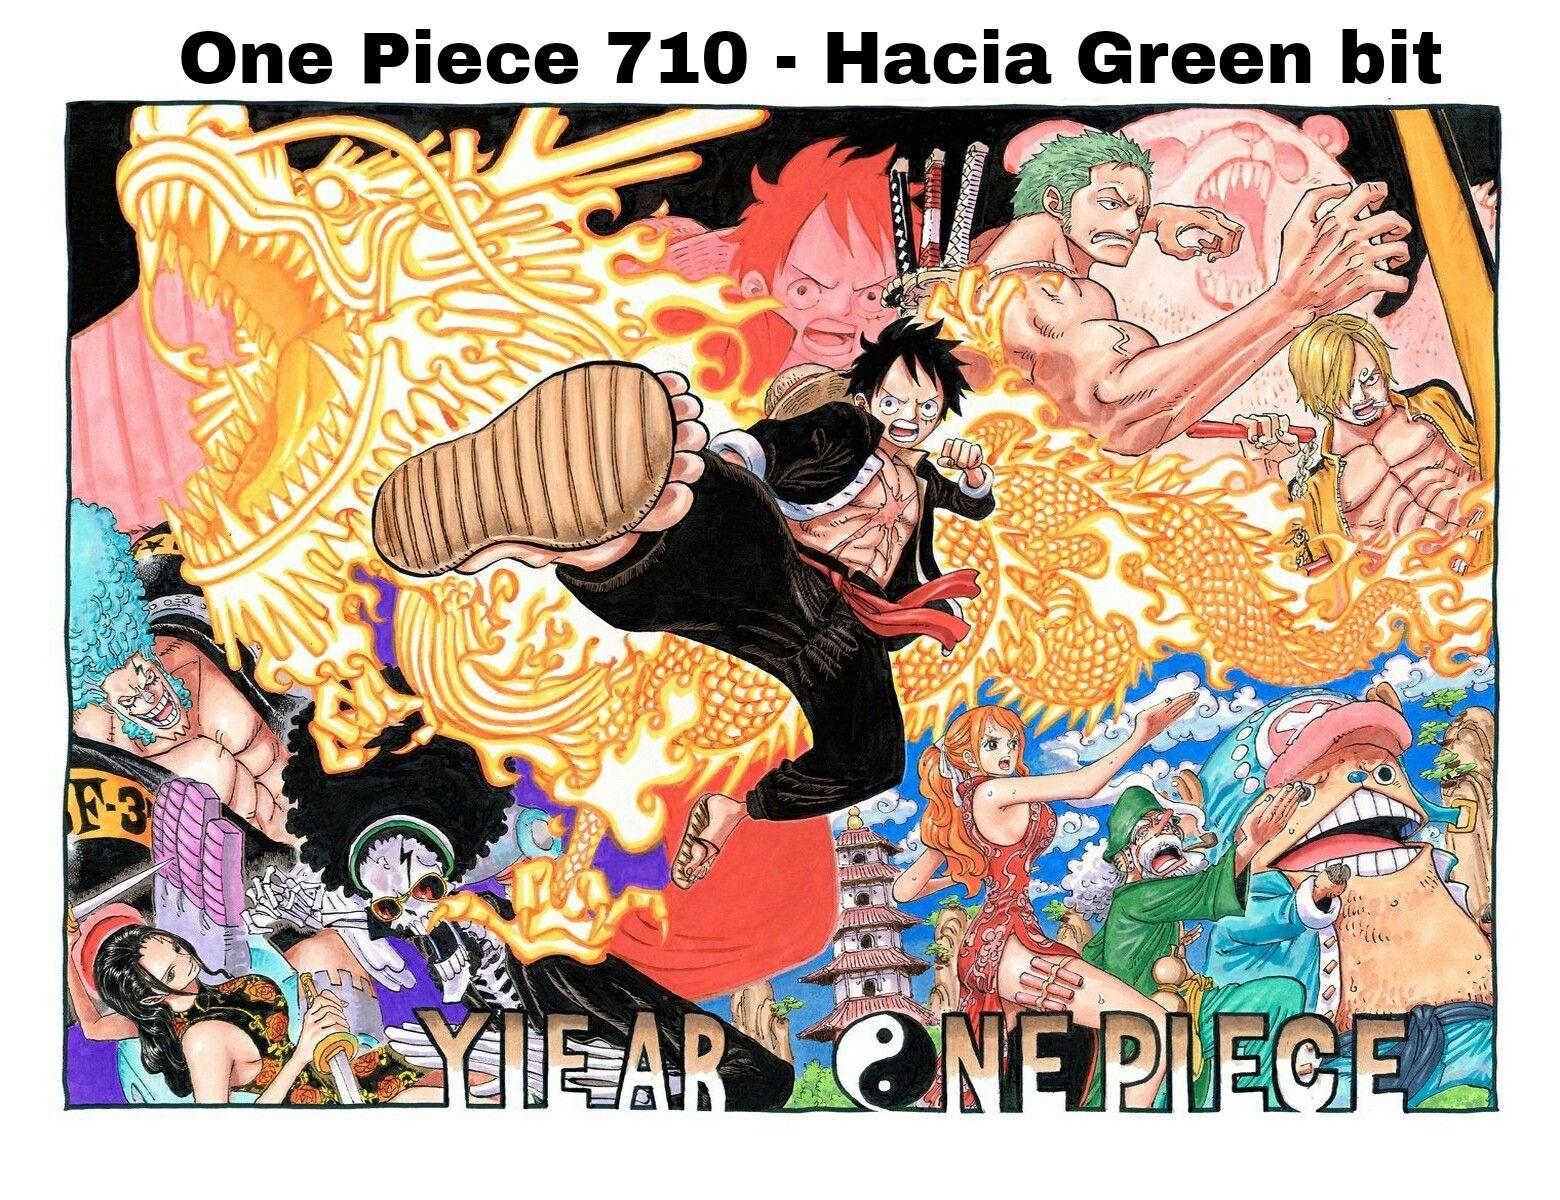 https://c5.ninemanga.com/es_manga/pic2/15/21071/523135/184cb48a11bd10712686ebd5611812af.jpg Page 1